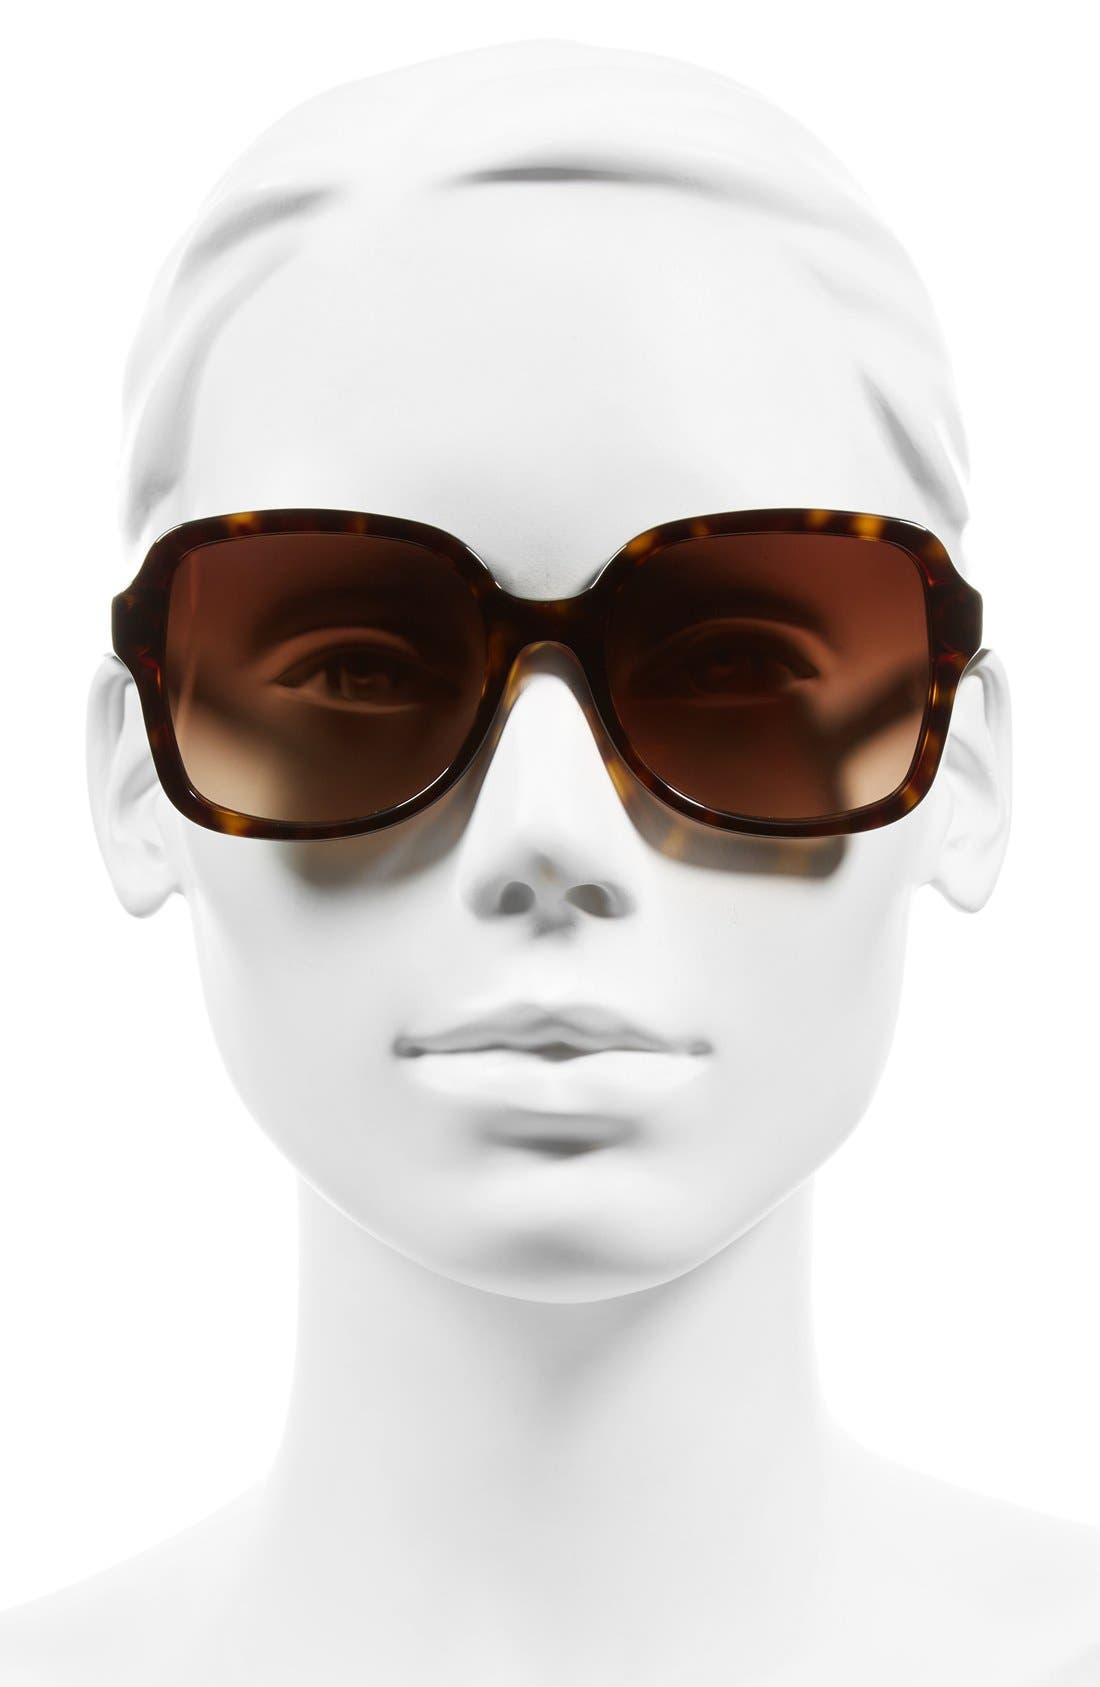 55mm Square Sunglasses,                             Alternate thumbnail 2, color,                             DARK TORTOISE